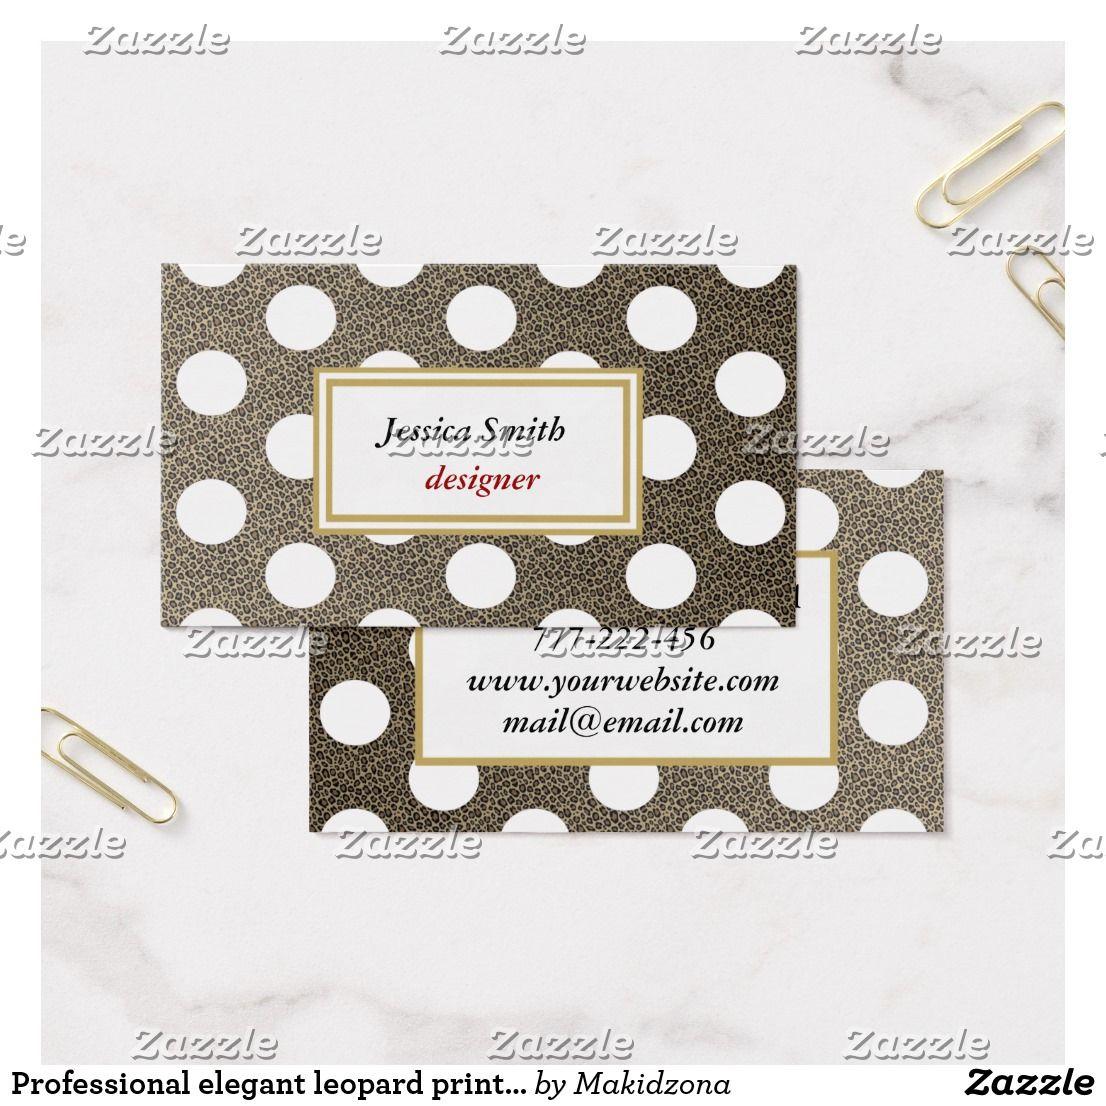 Professional elegant leopard print polka dots business card professional elegant leopard print polka dots business card reheart Image collections